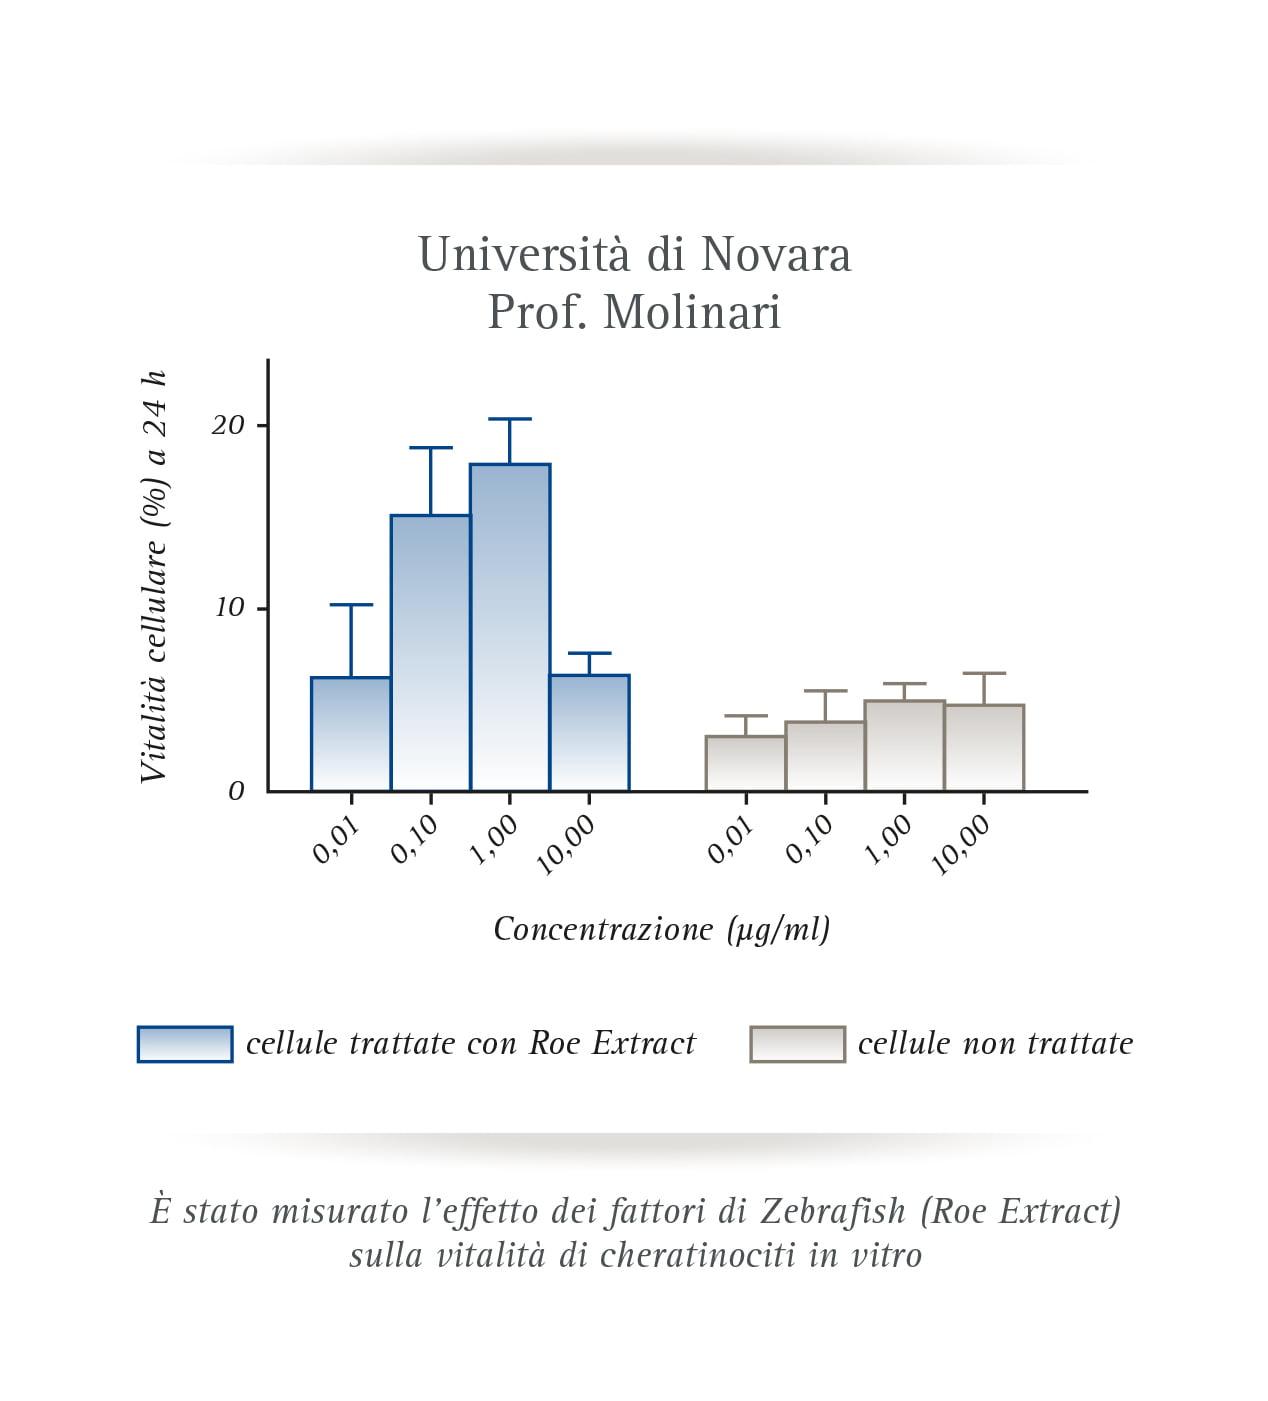 Studi Università di Novara Prof. Molinari